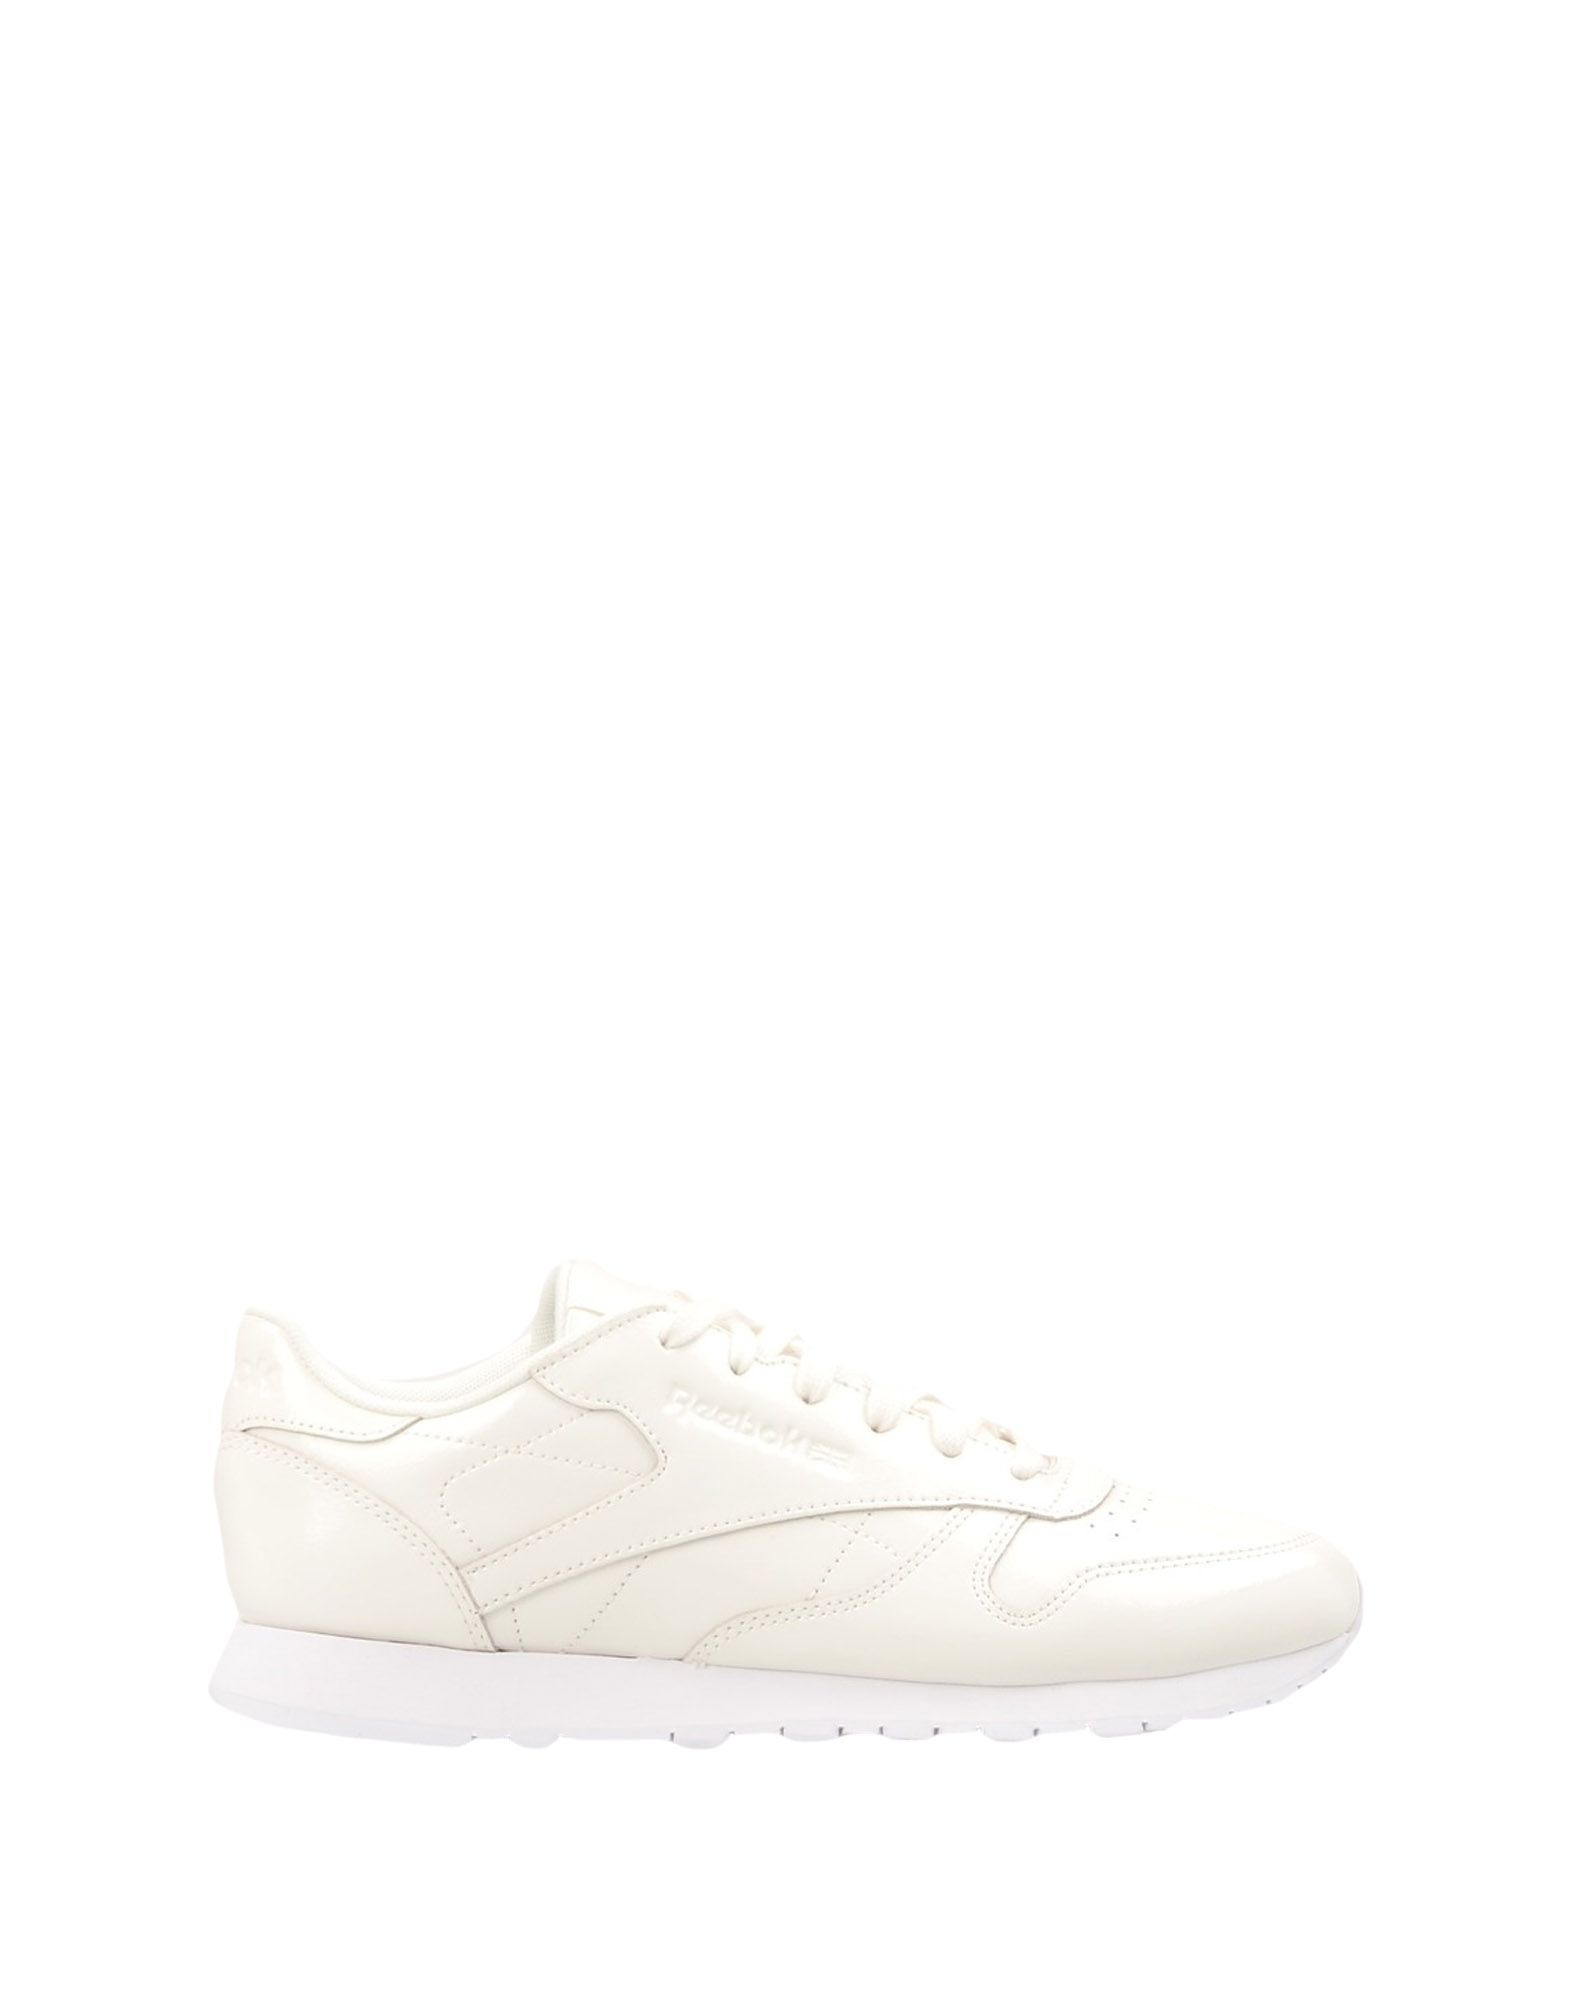 Sneakers Reebok Cl Lthr Patent - Femme - Sneakers Reebok sur